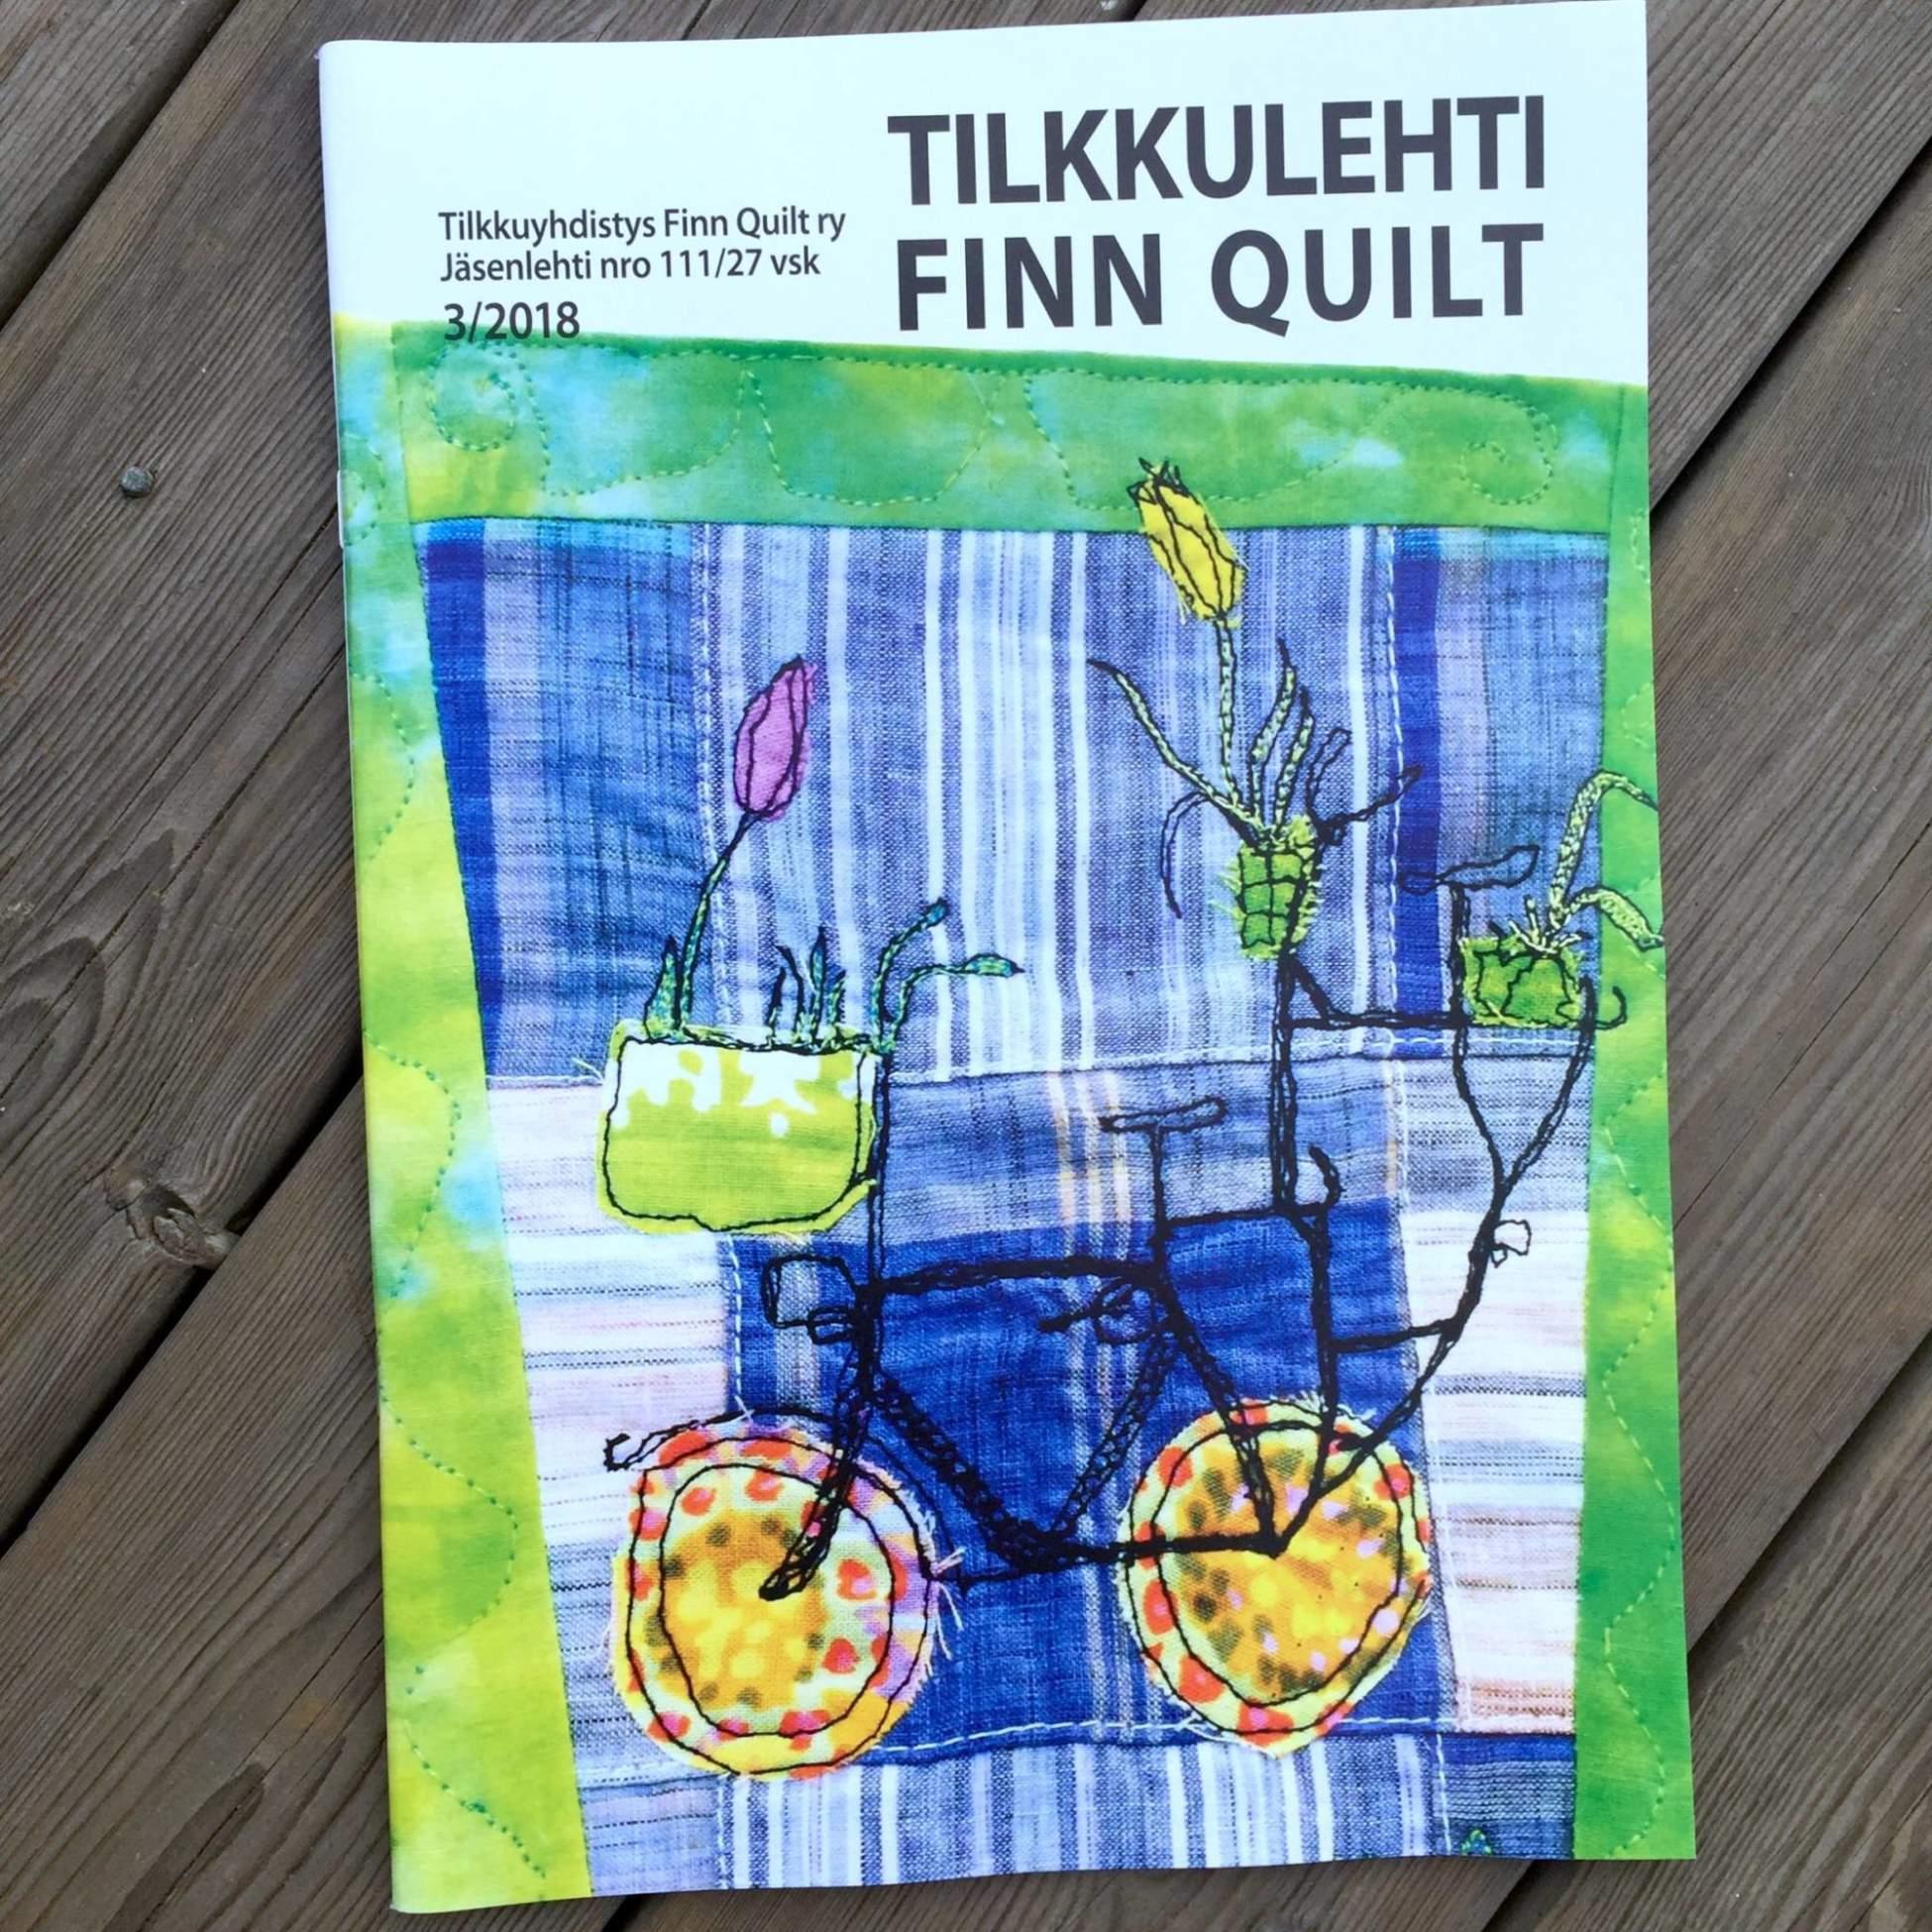 Tilkkulehden 3/2018 kansi